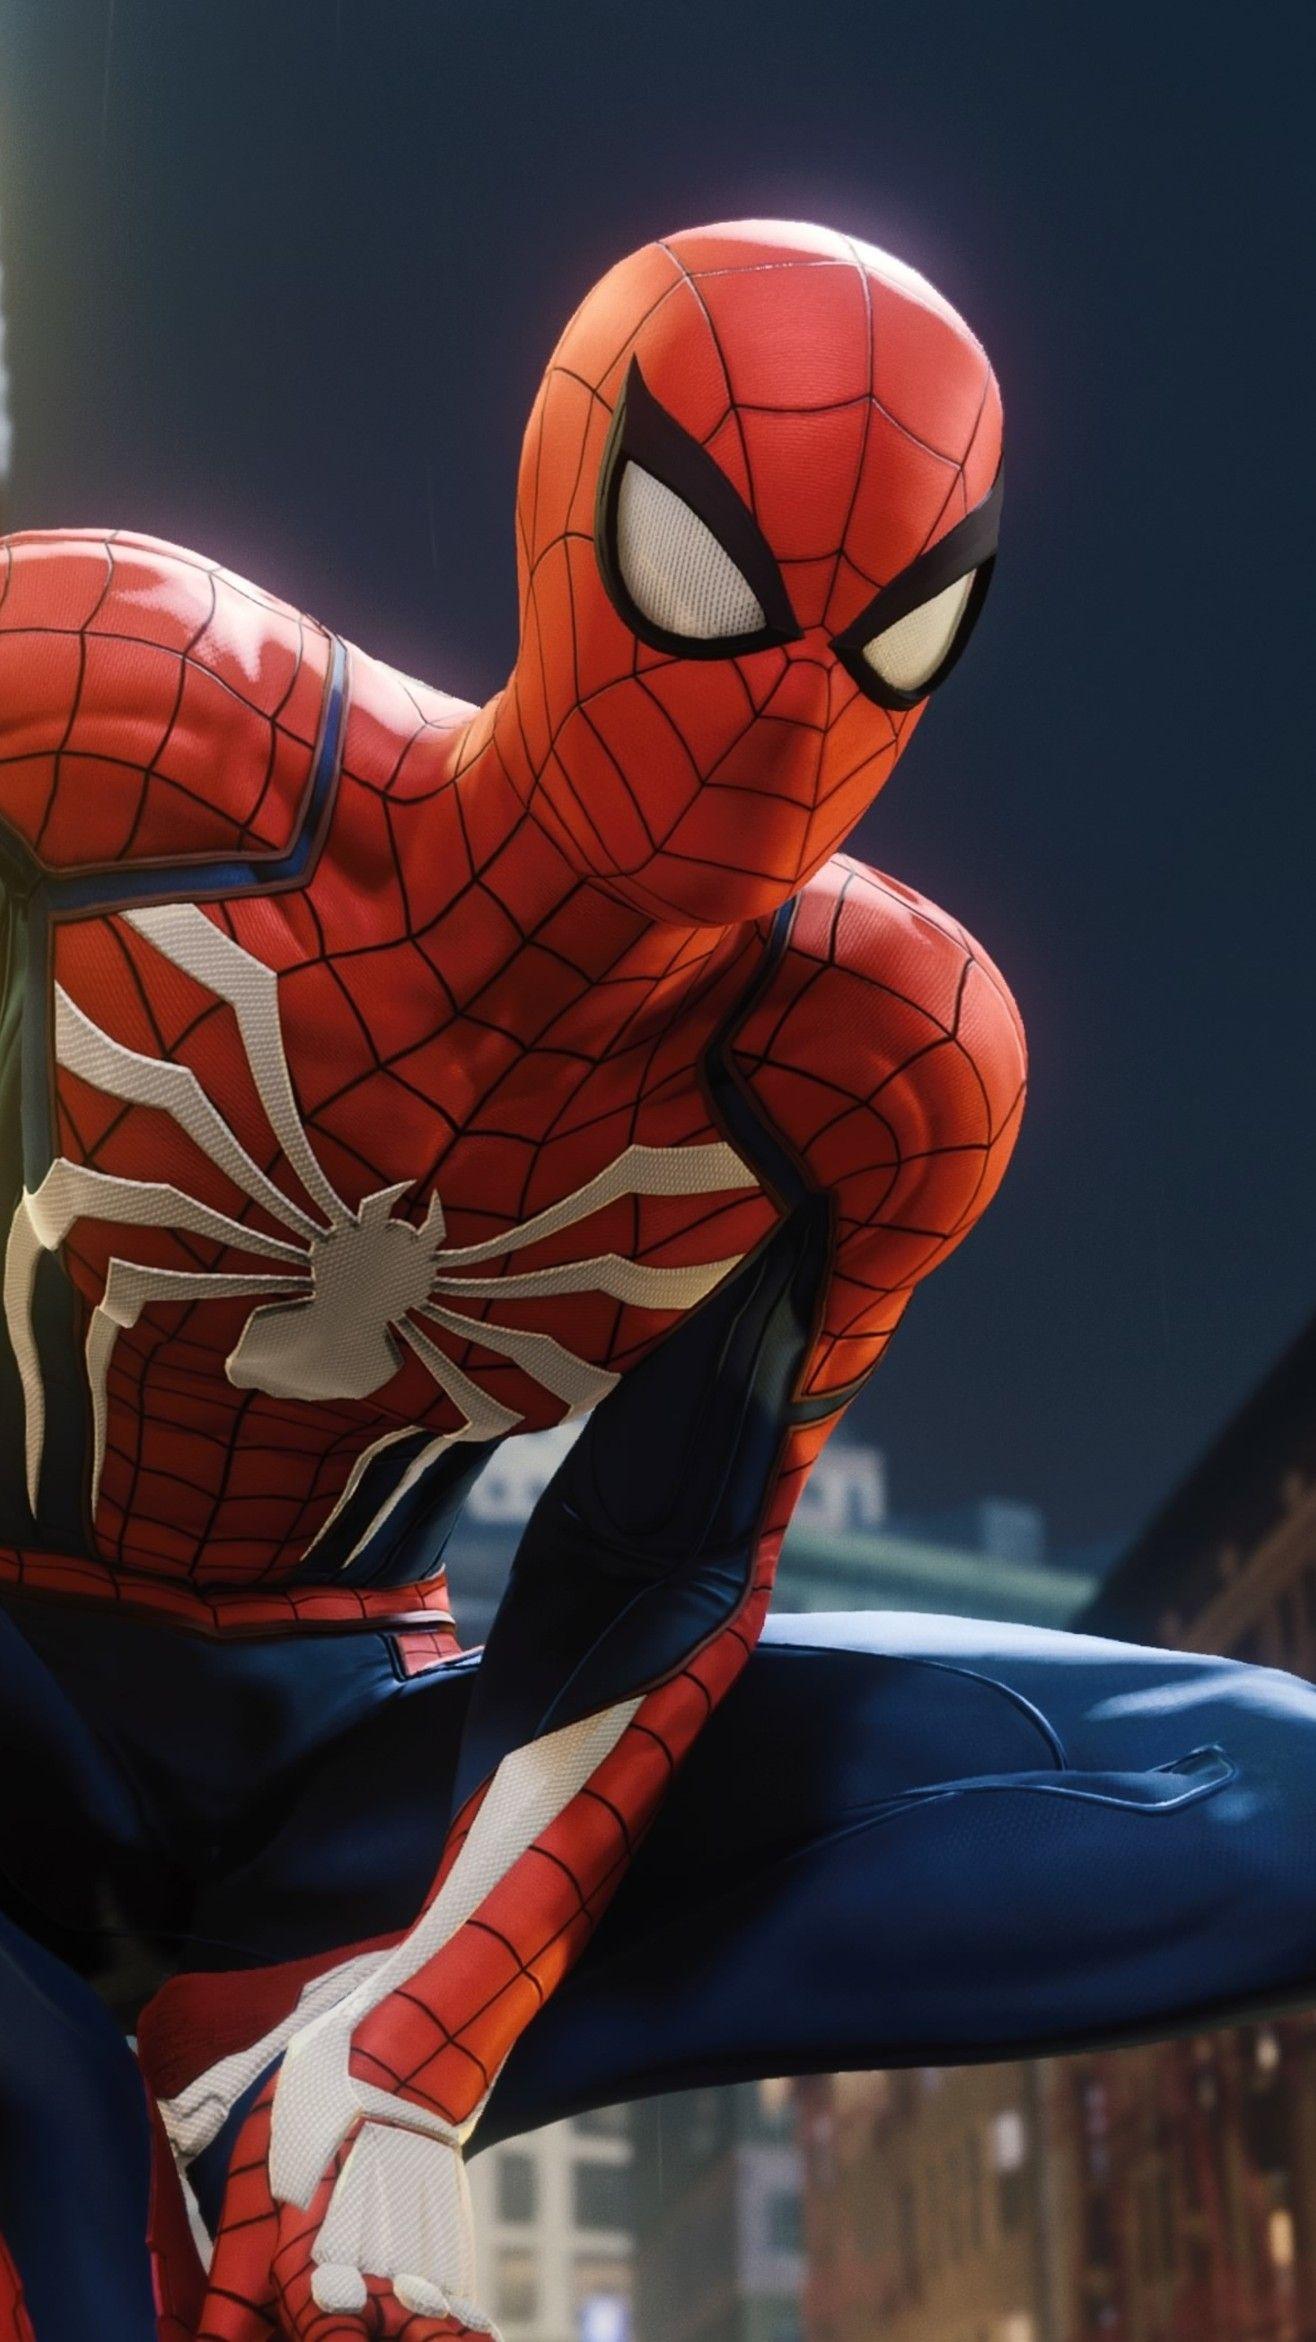 SpiderMan PS4 Spiderman, Spiderman comic, Marvel spiderman